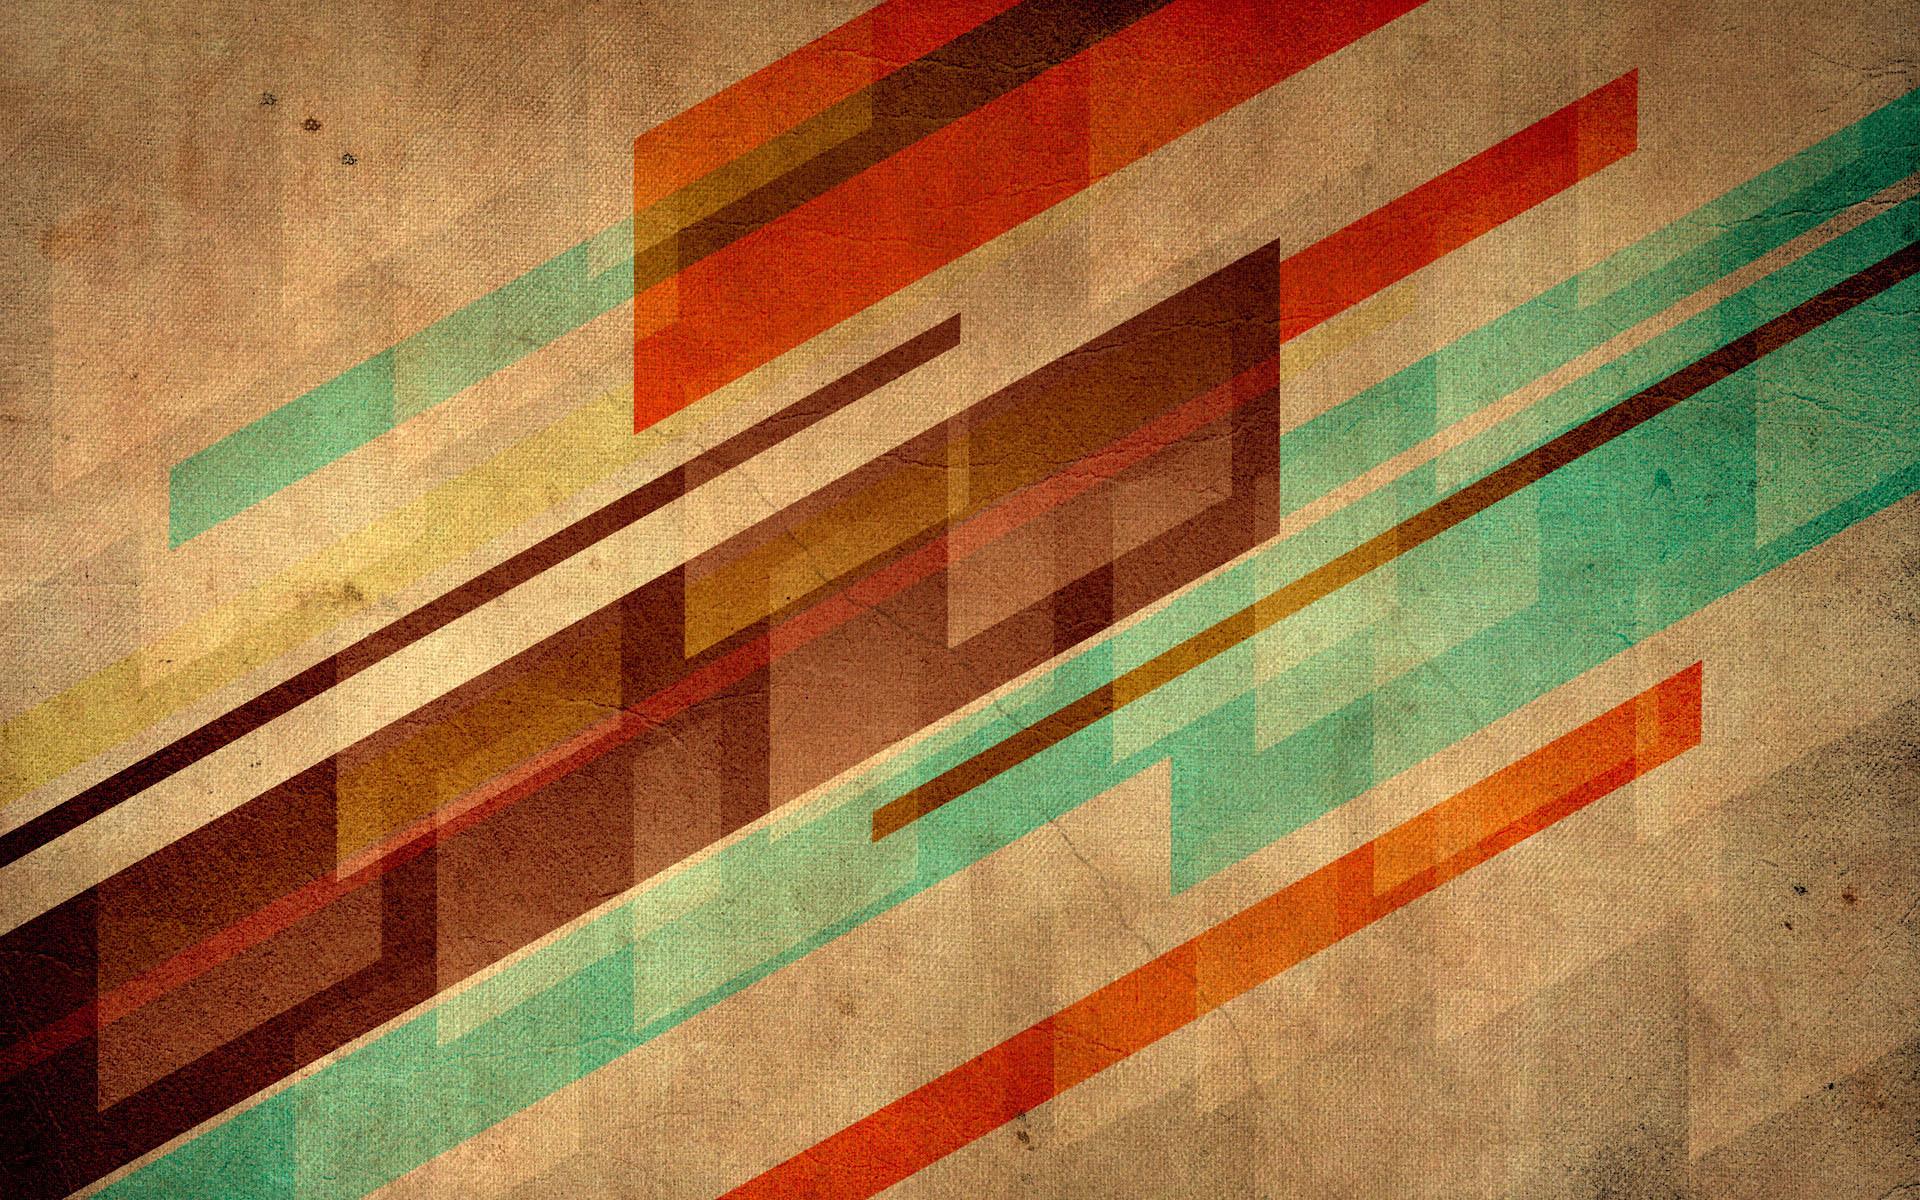 -Mac-Wa c-Wallpapers- Colorful Wallpaper Hd Mac